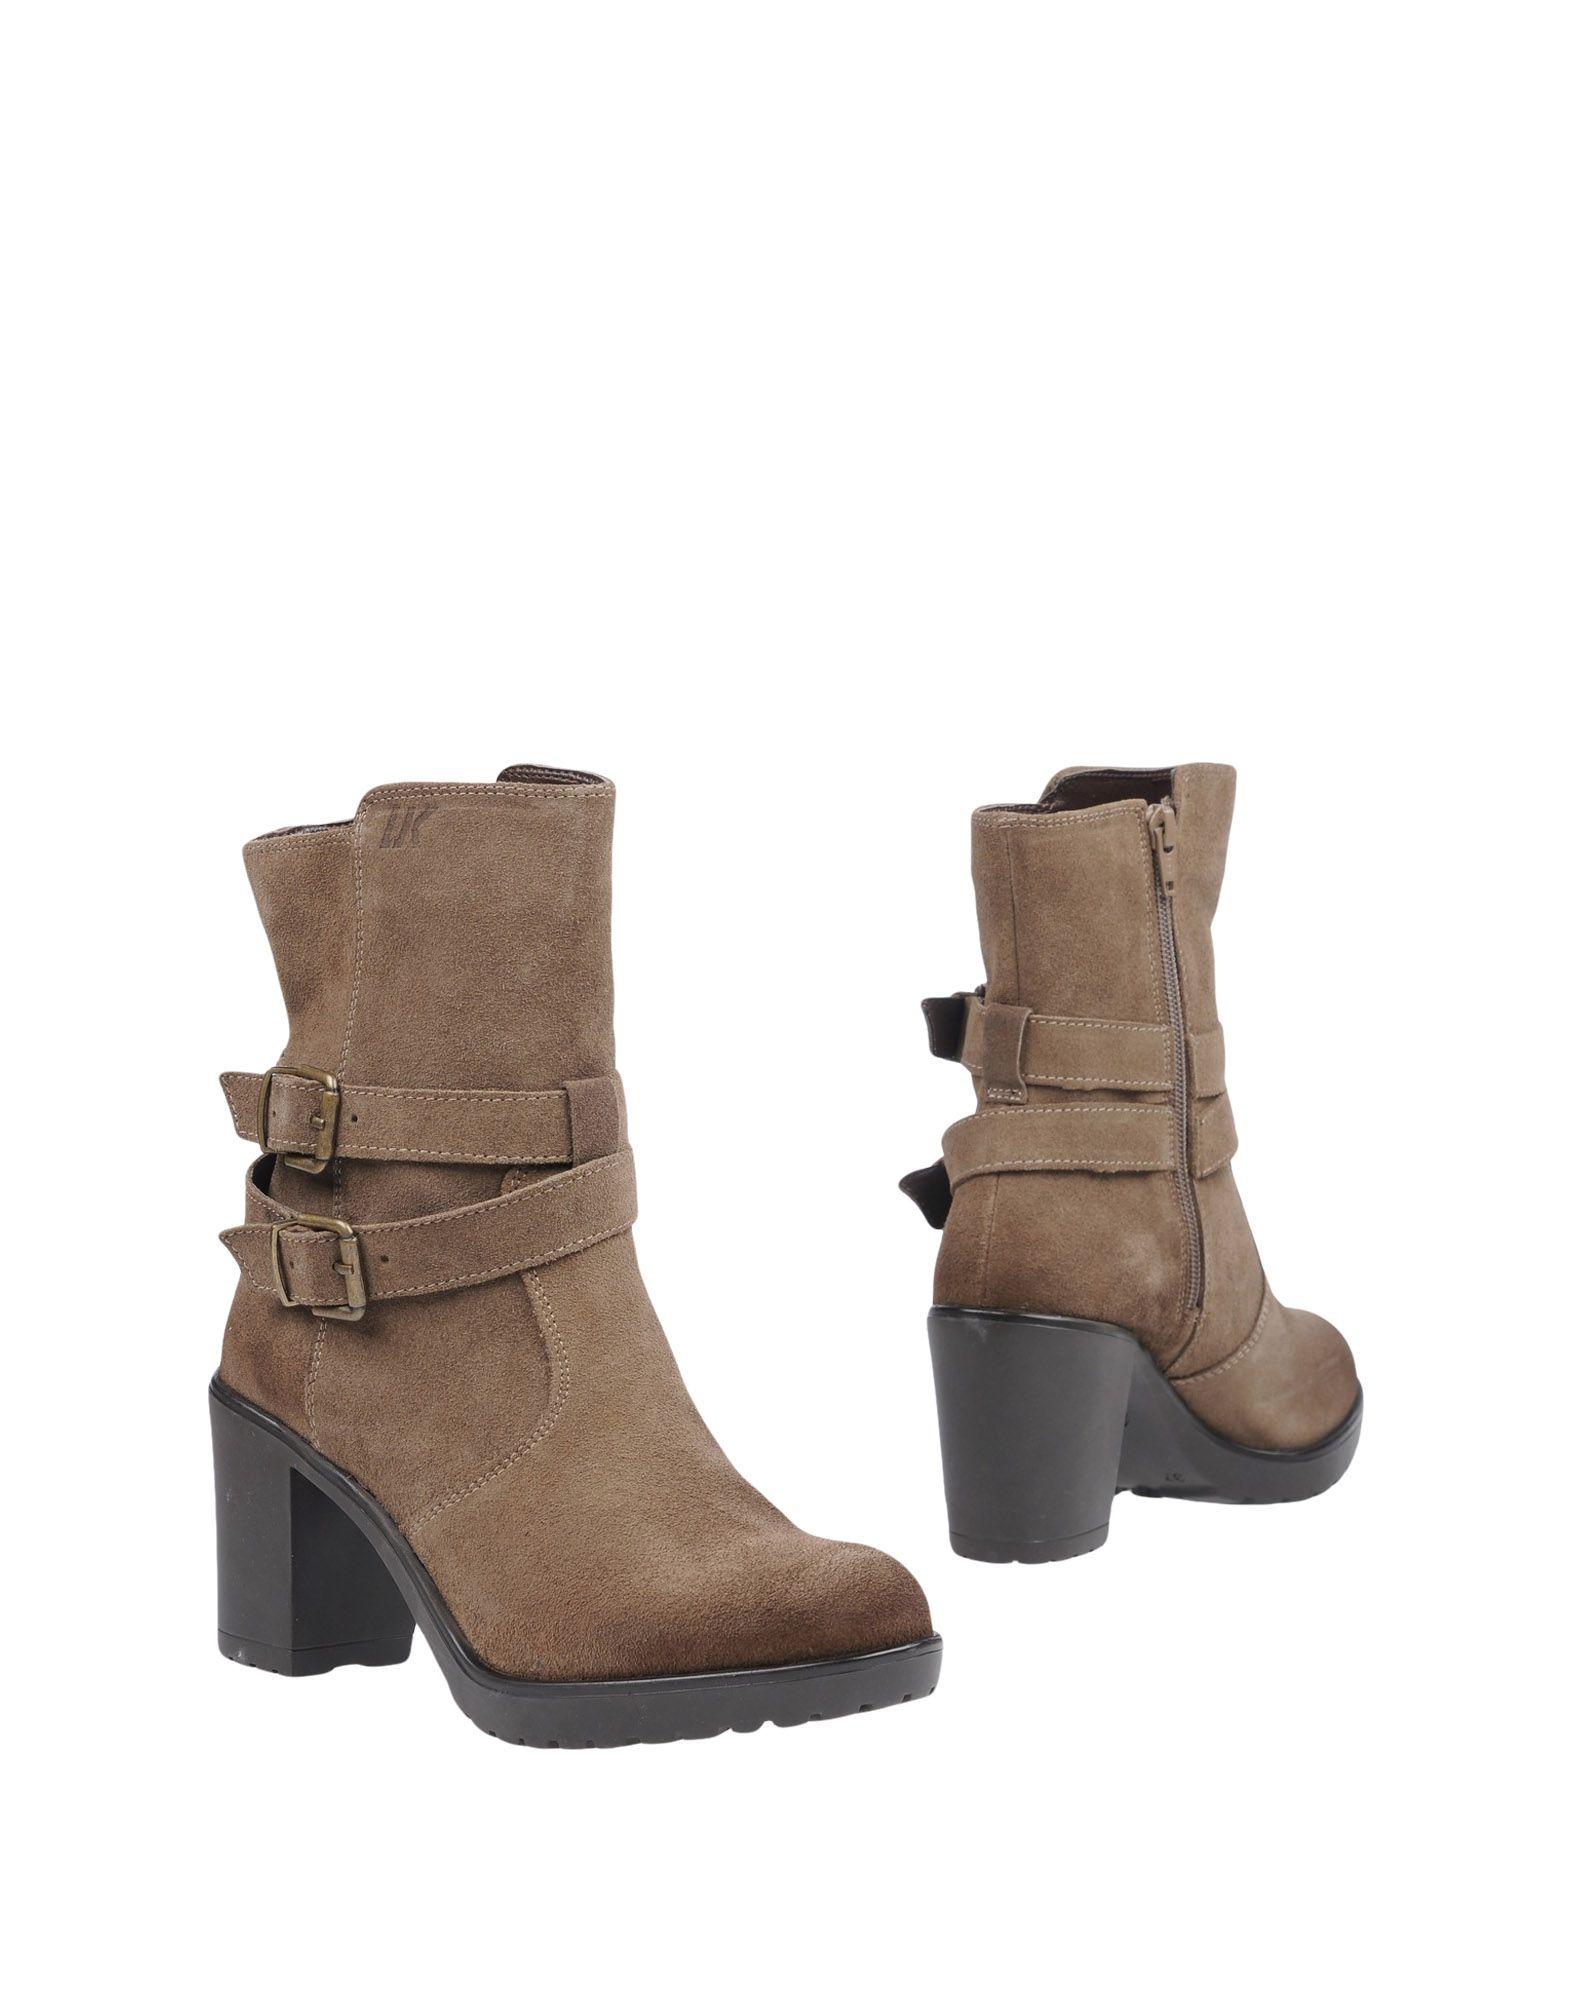 Lumberjack Stiefelette Damen  11344492KQ Gute Qualität beliebte Schuhe